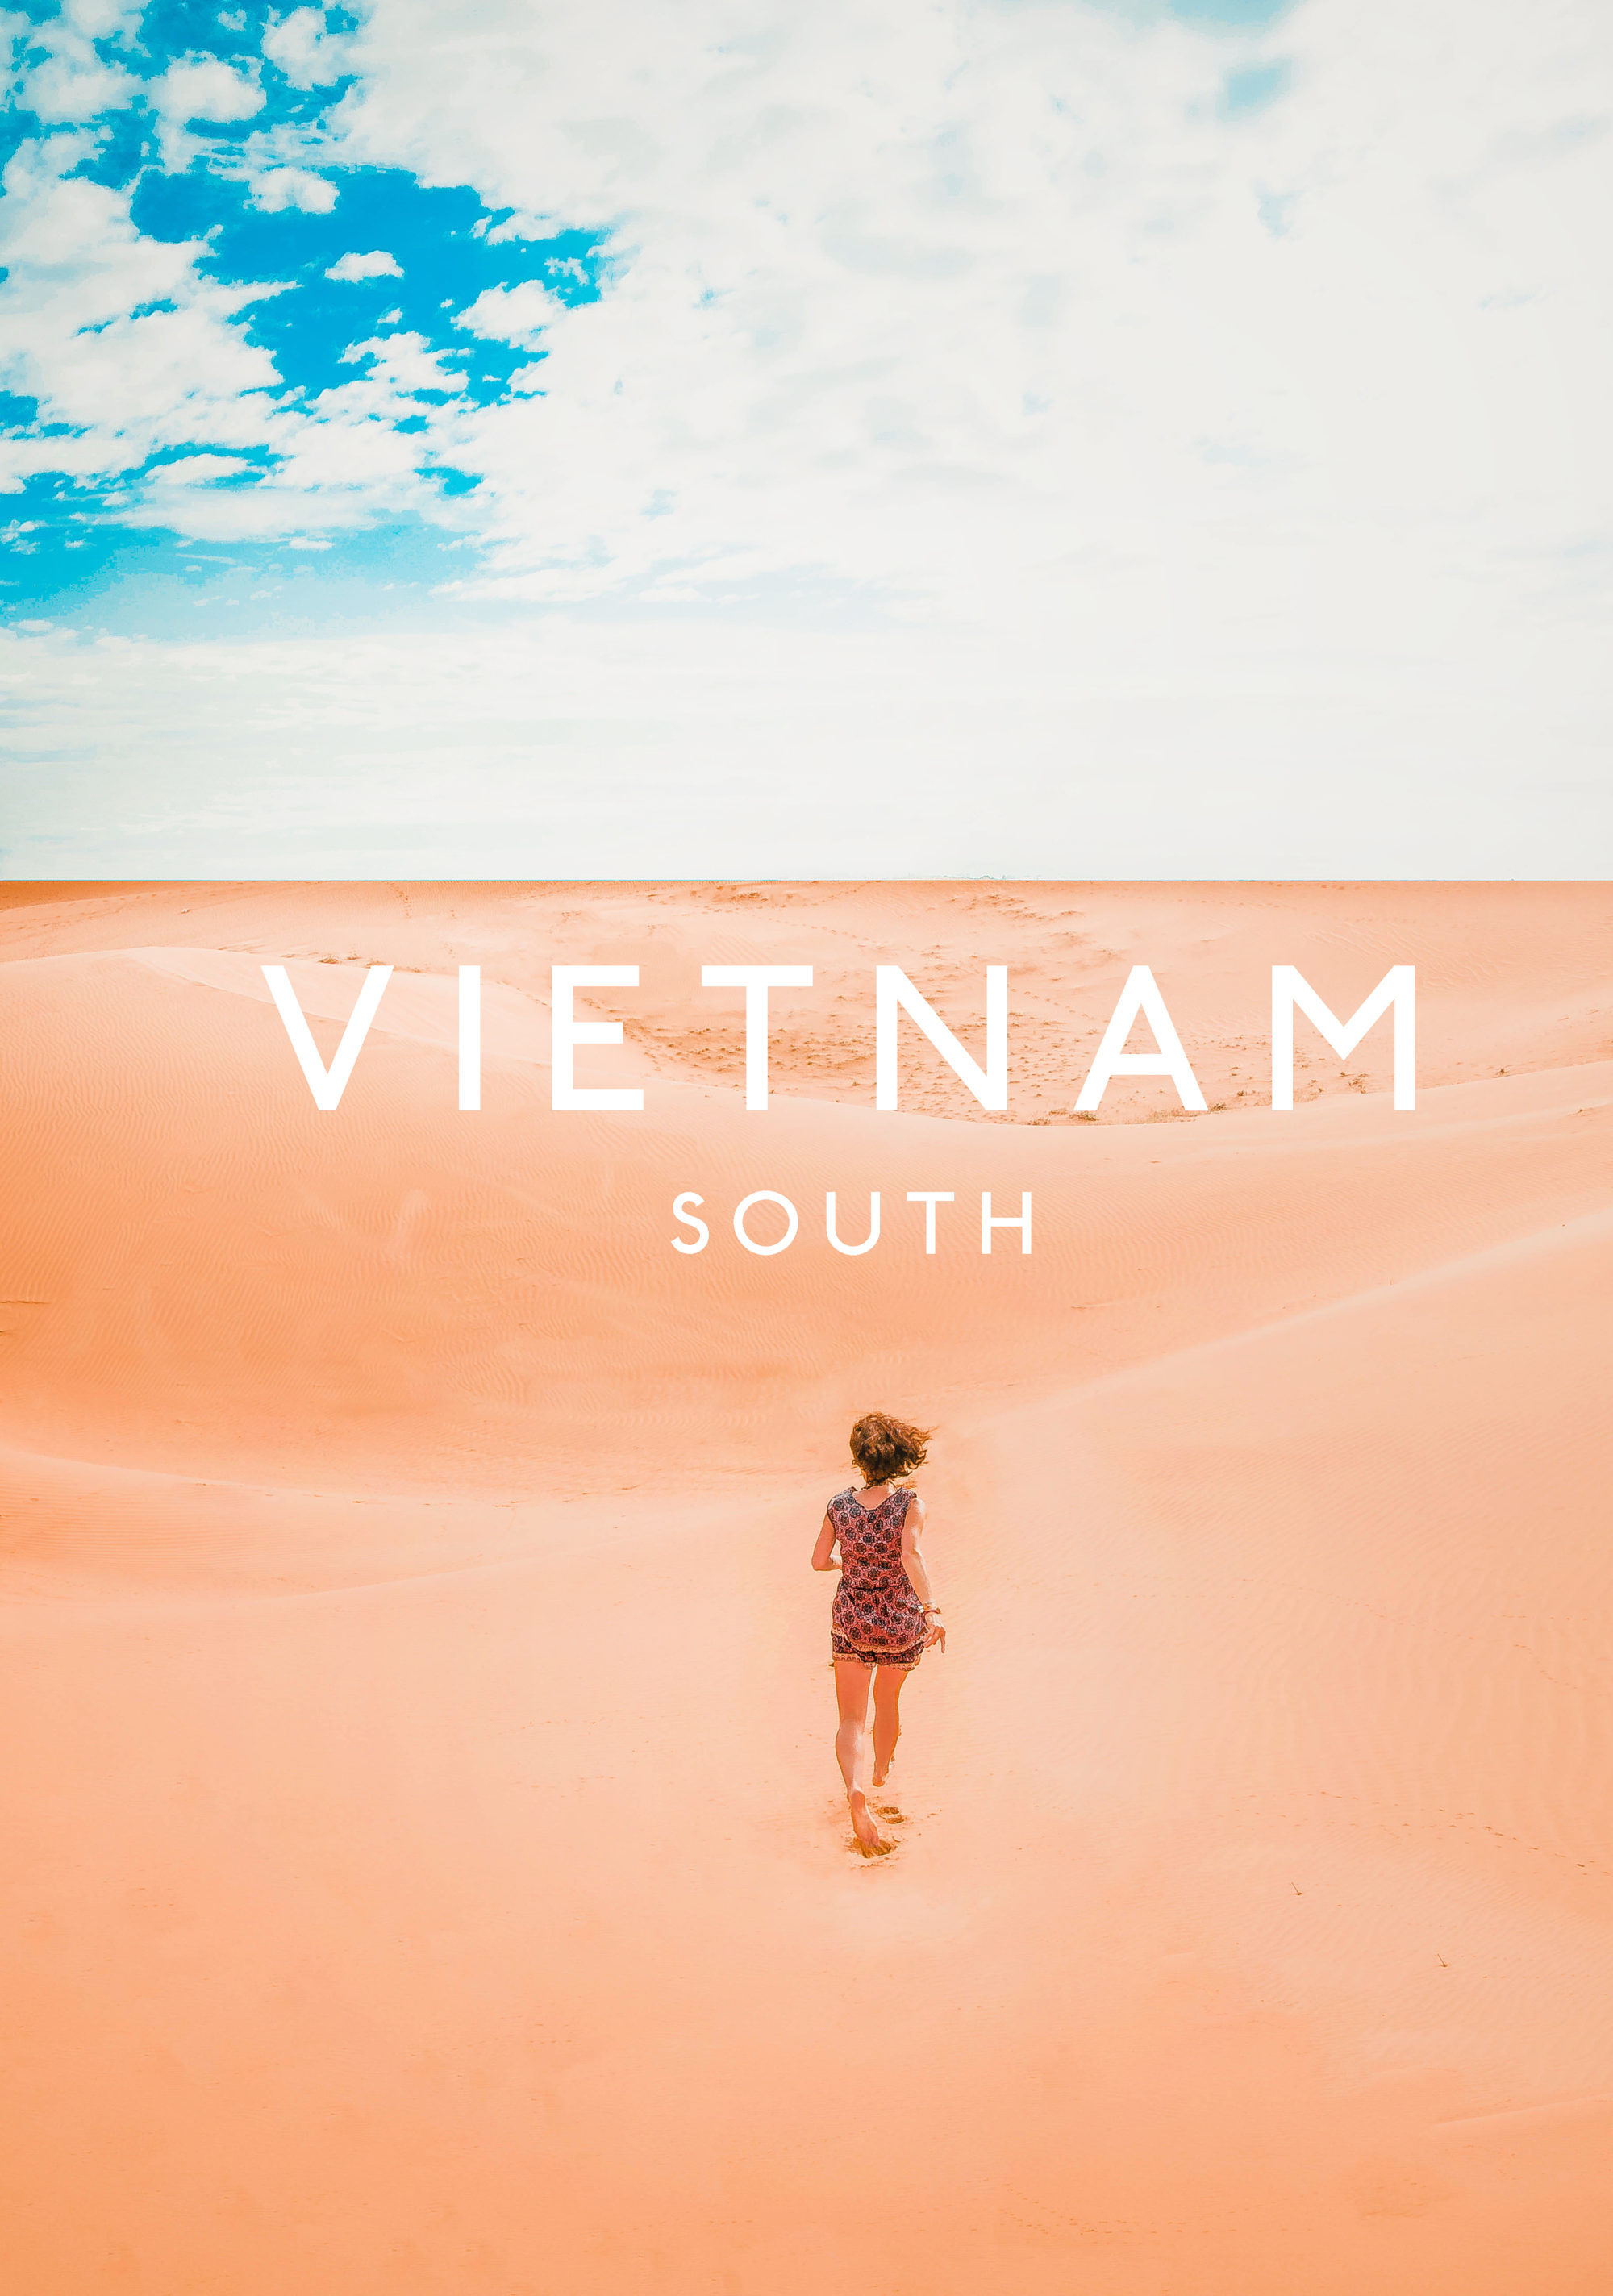 vietnam mui ne sand dunes running free sky is blue